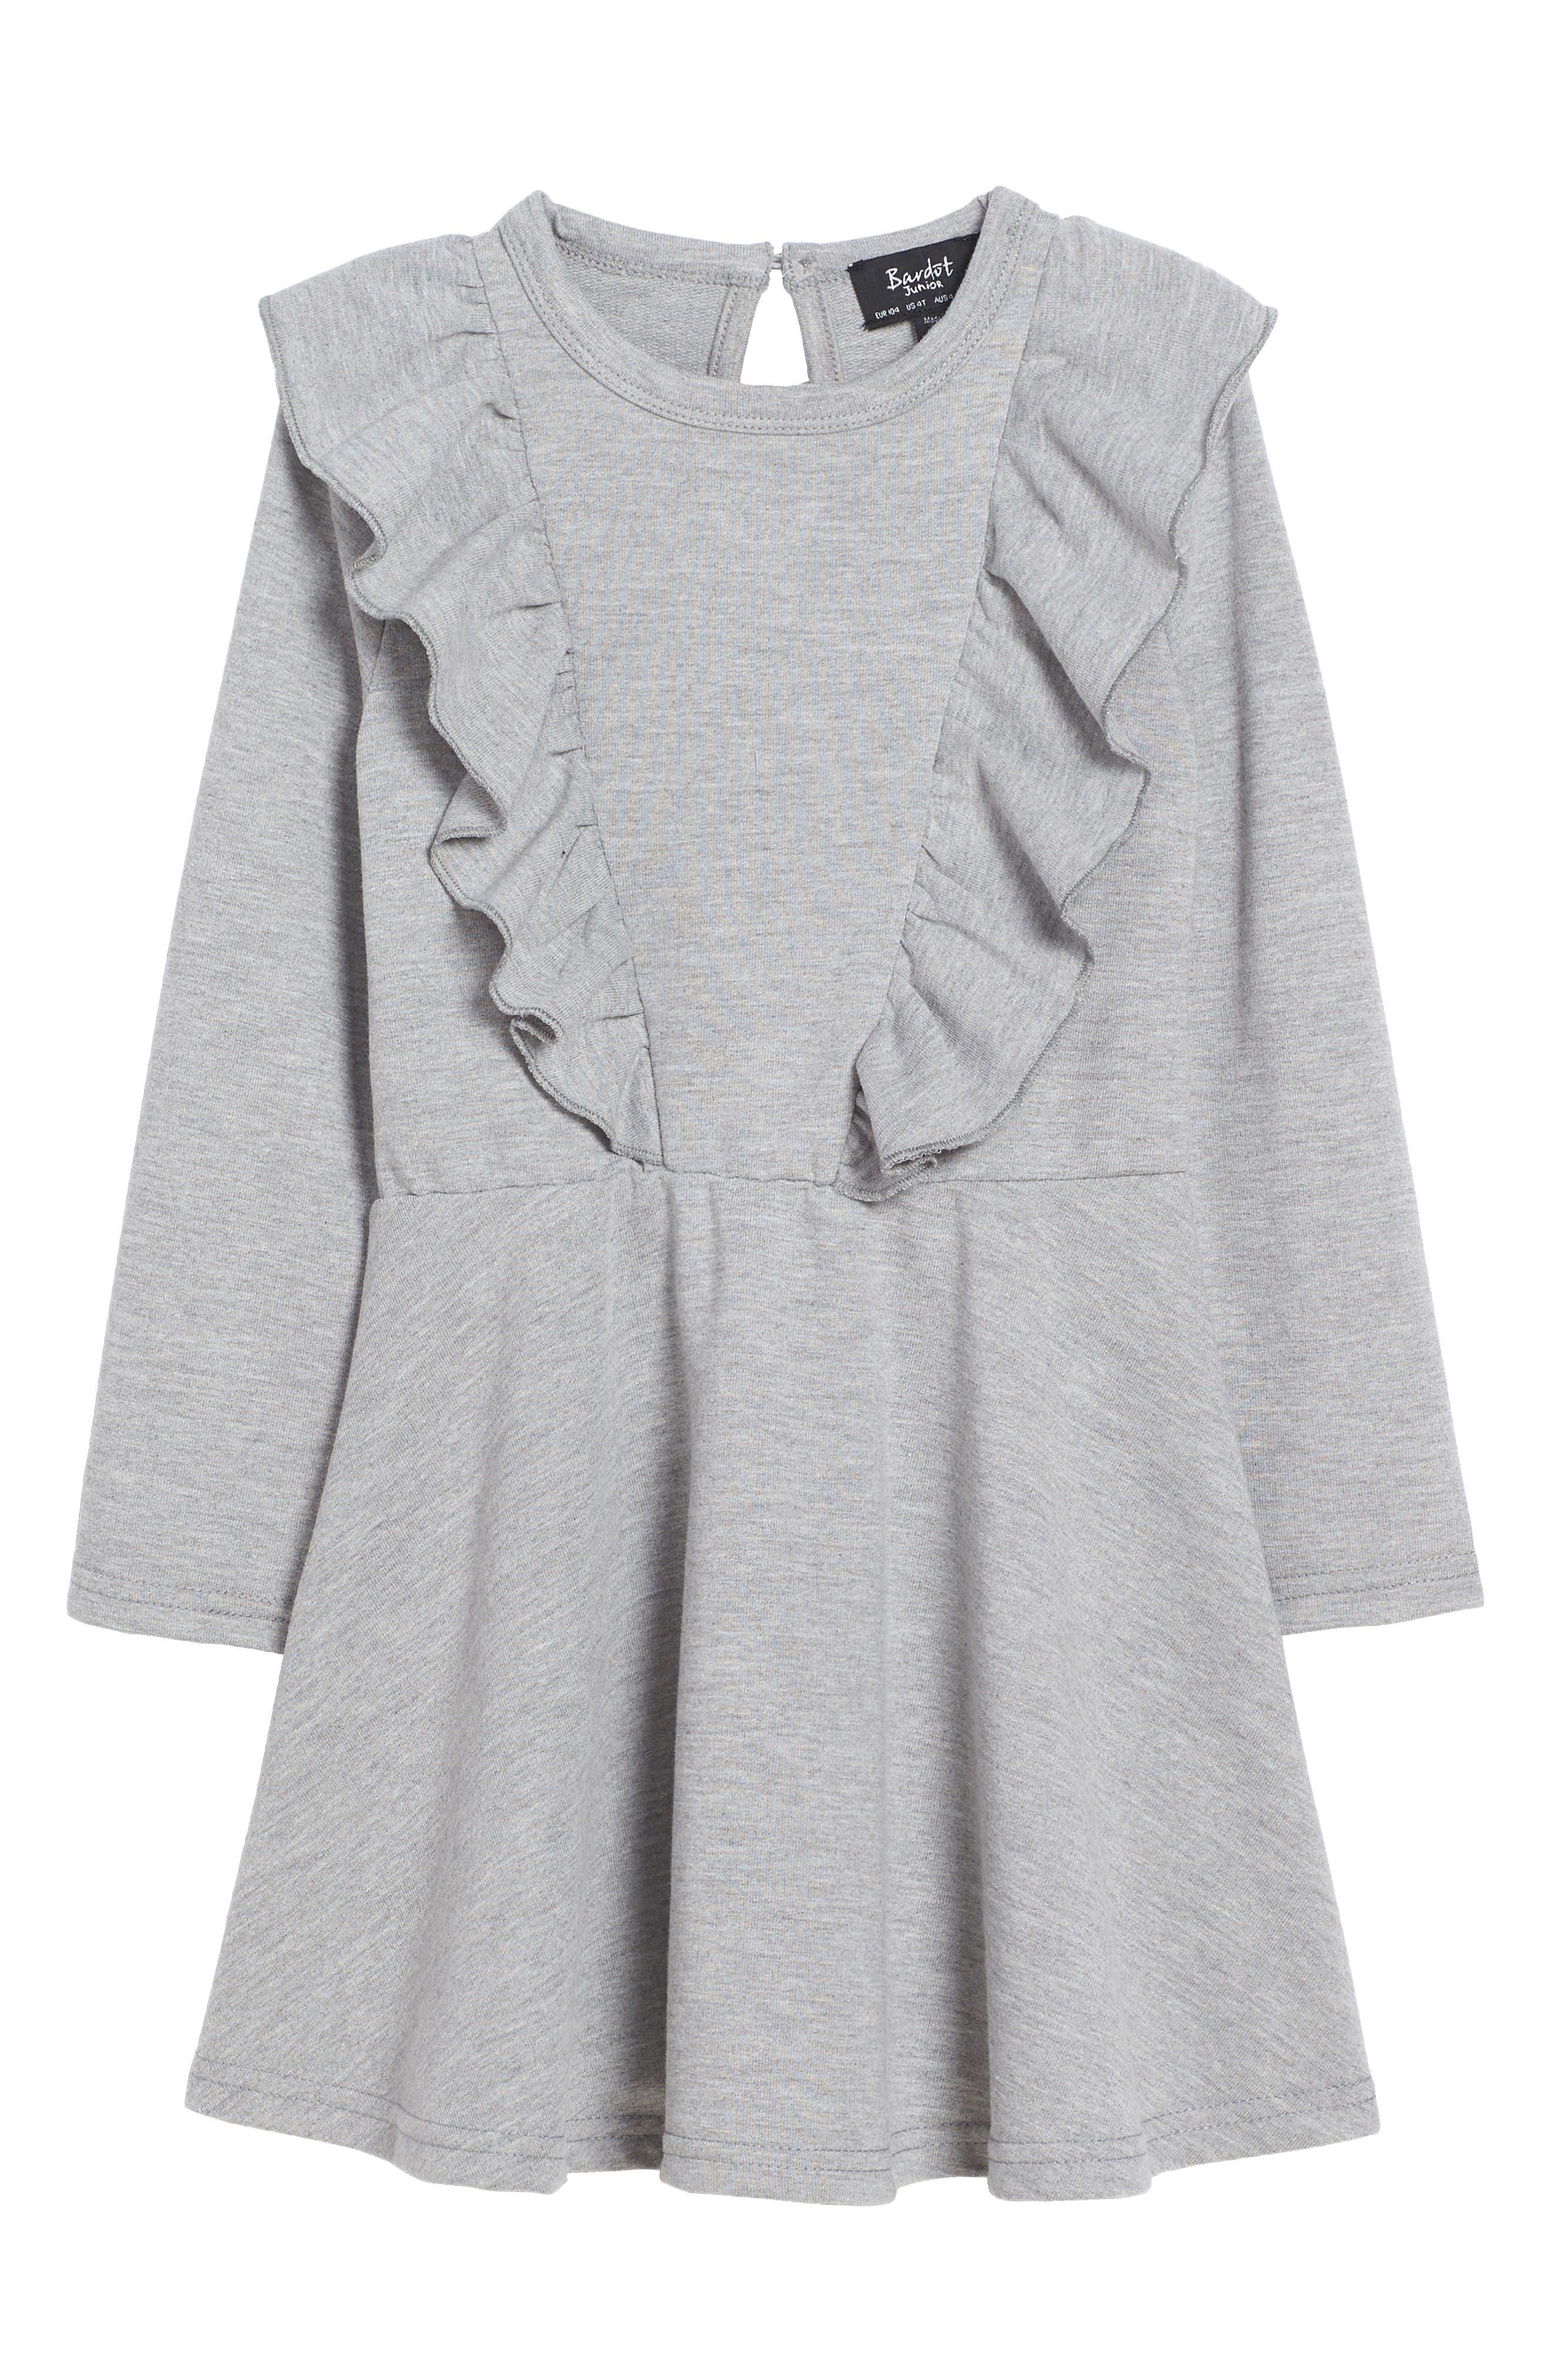 Alternate Image 1 Selected - Bardot Junior Frill of It Ruffle Dress (Big Girls)